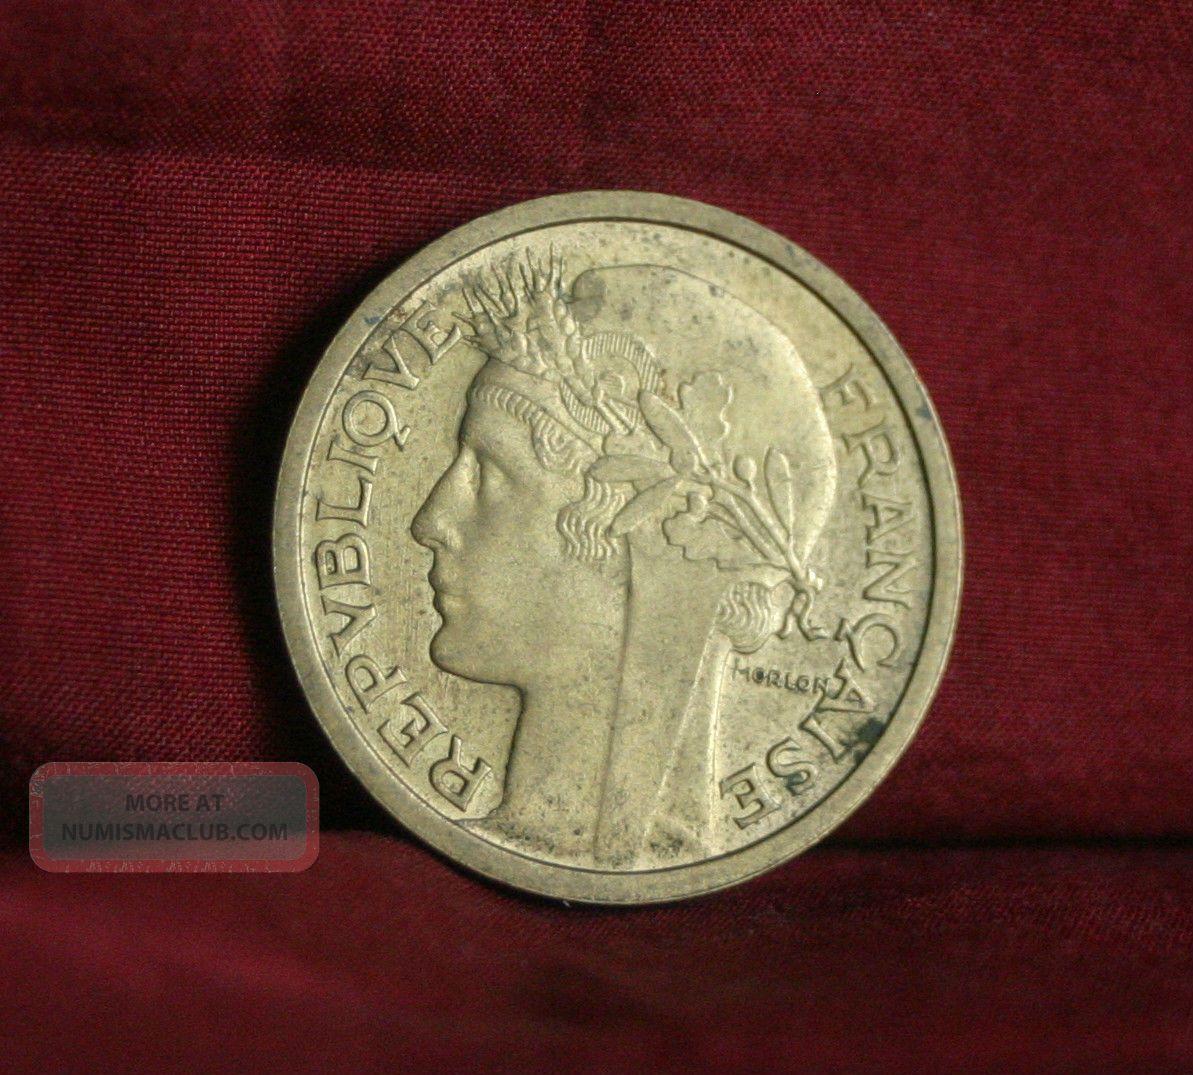 1941 France 1 Franc World Coin Km885 Wwii Liberty Head Cornucopia French Europe photo